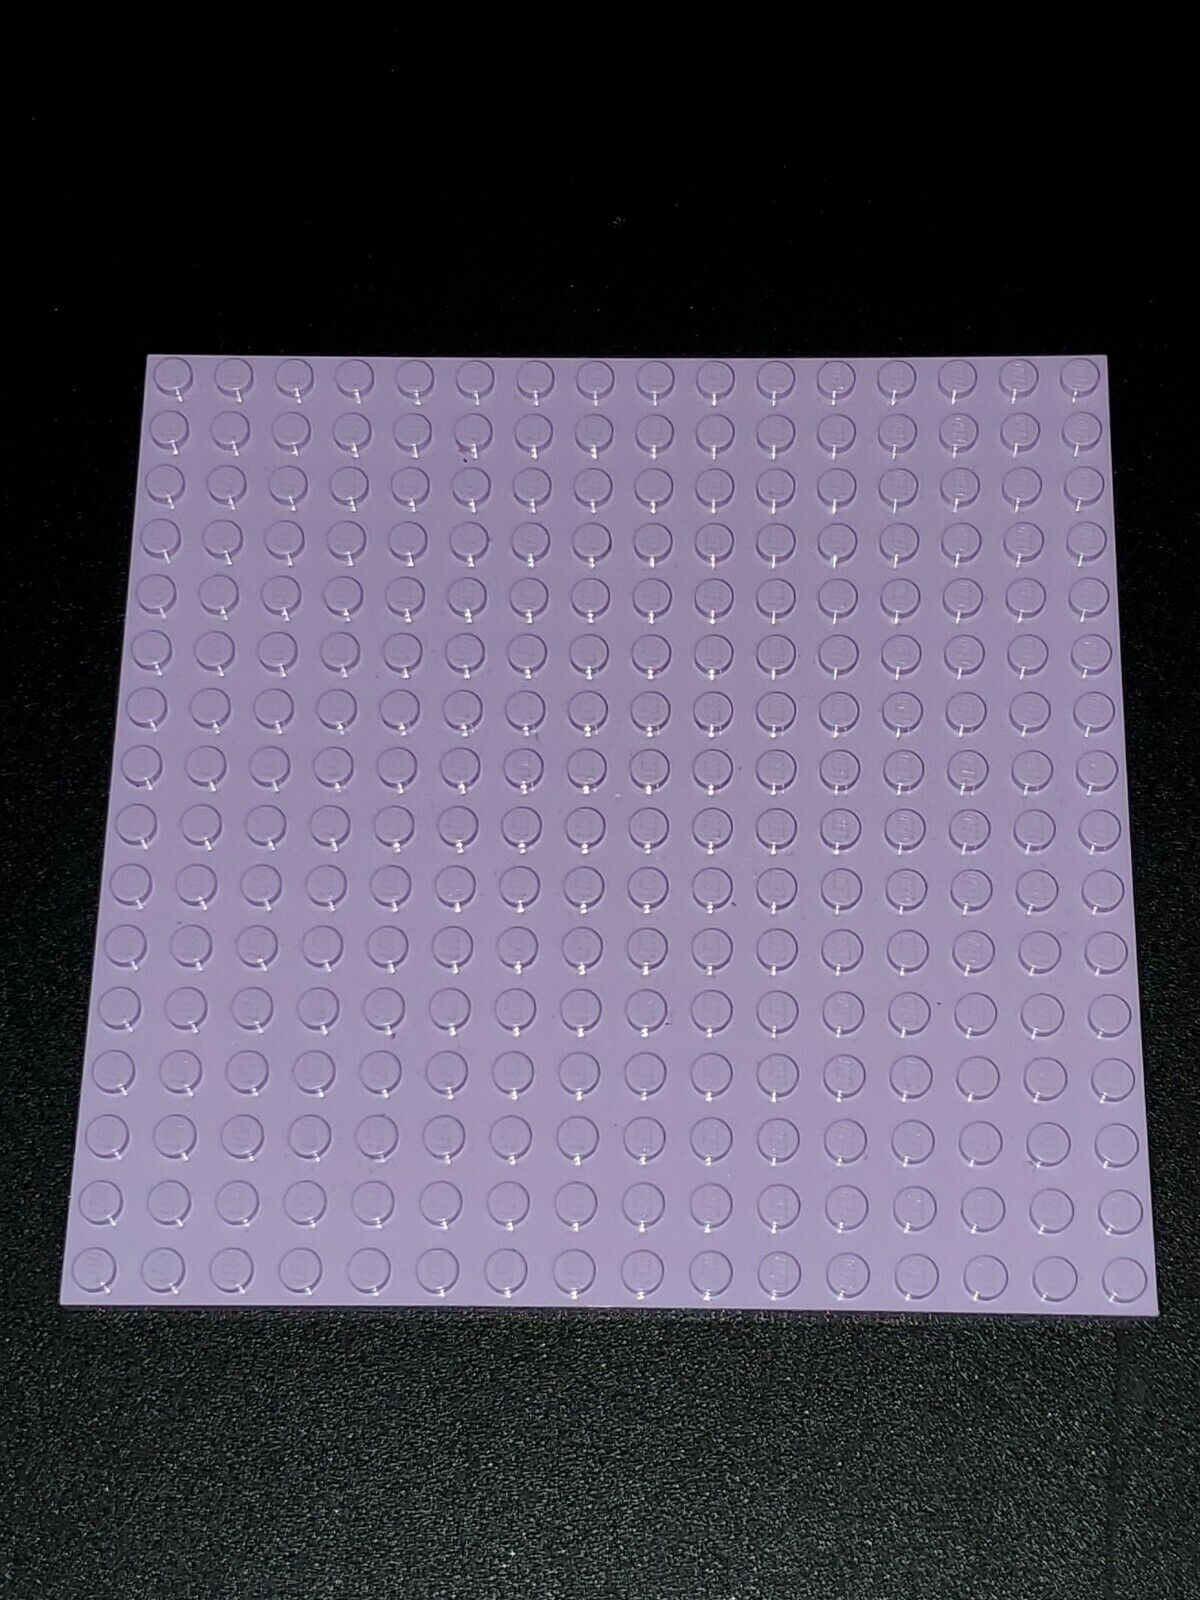 LEGO City 1 Bauplatte 16 X 16 In Clair Vert plus épais